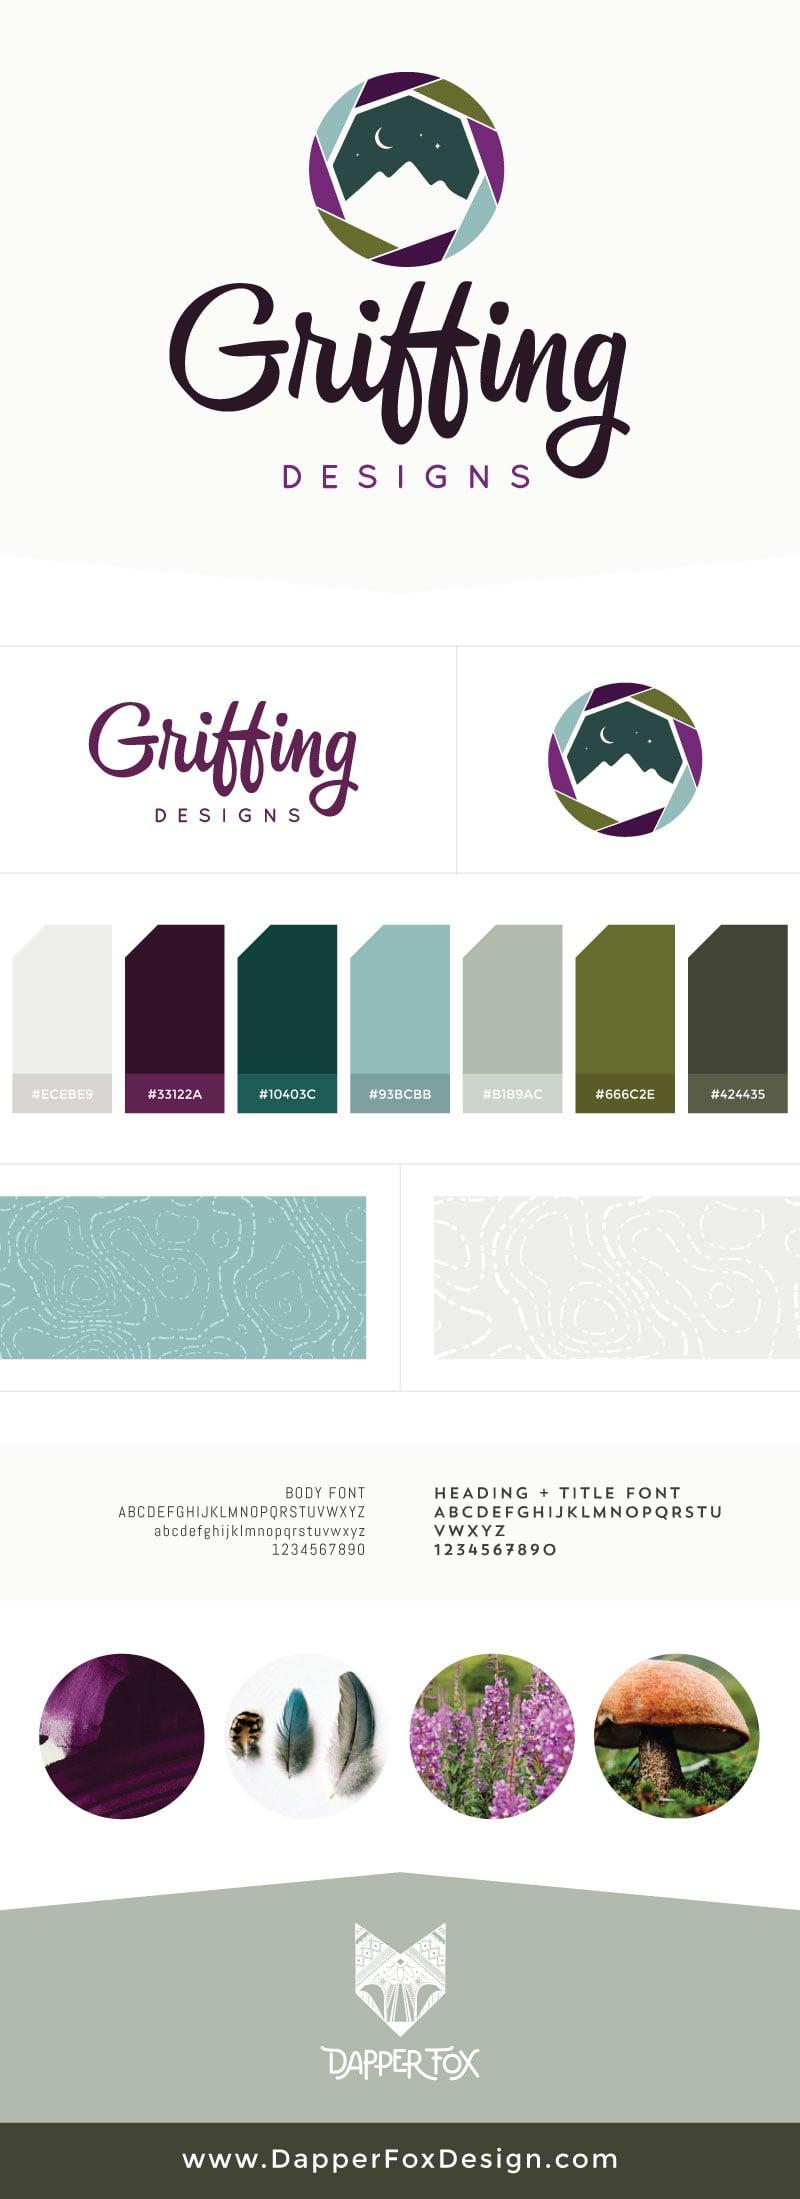 Brand Board for Griffing Designs - Modern Logo Design, Earthy, Green, Blue, Purple Branding, Artistic Logo. Brand and Websites by Dapper Fox Design